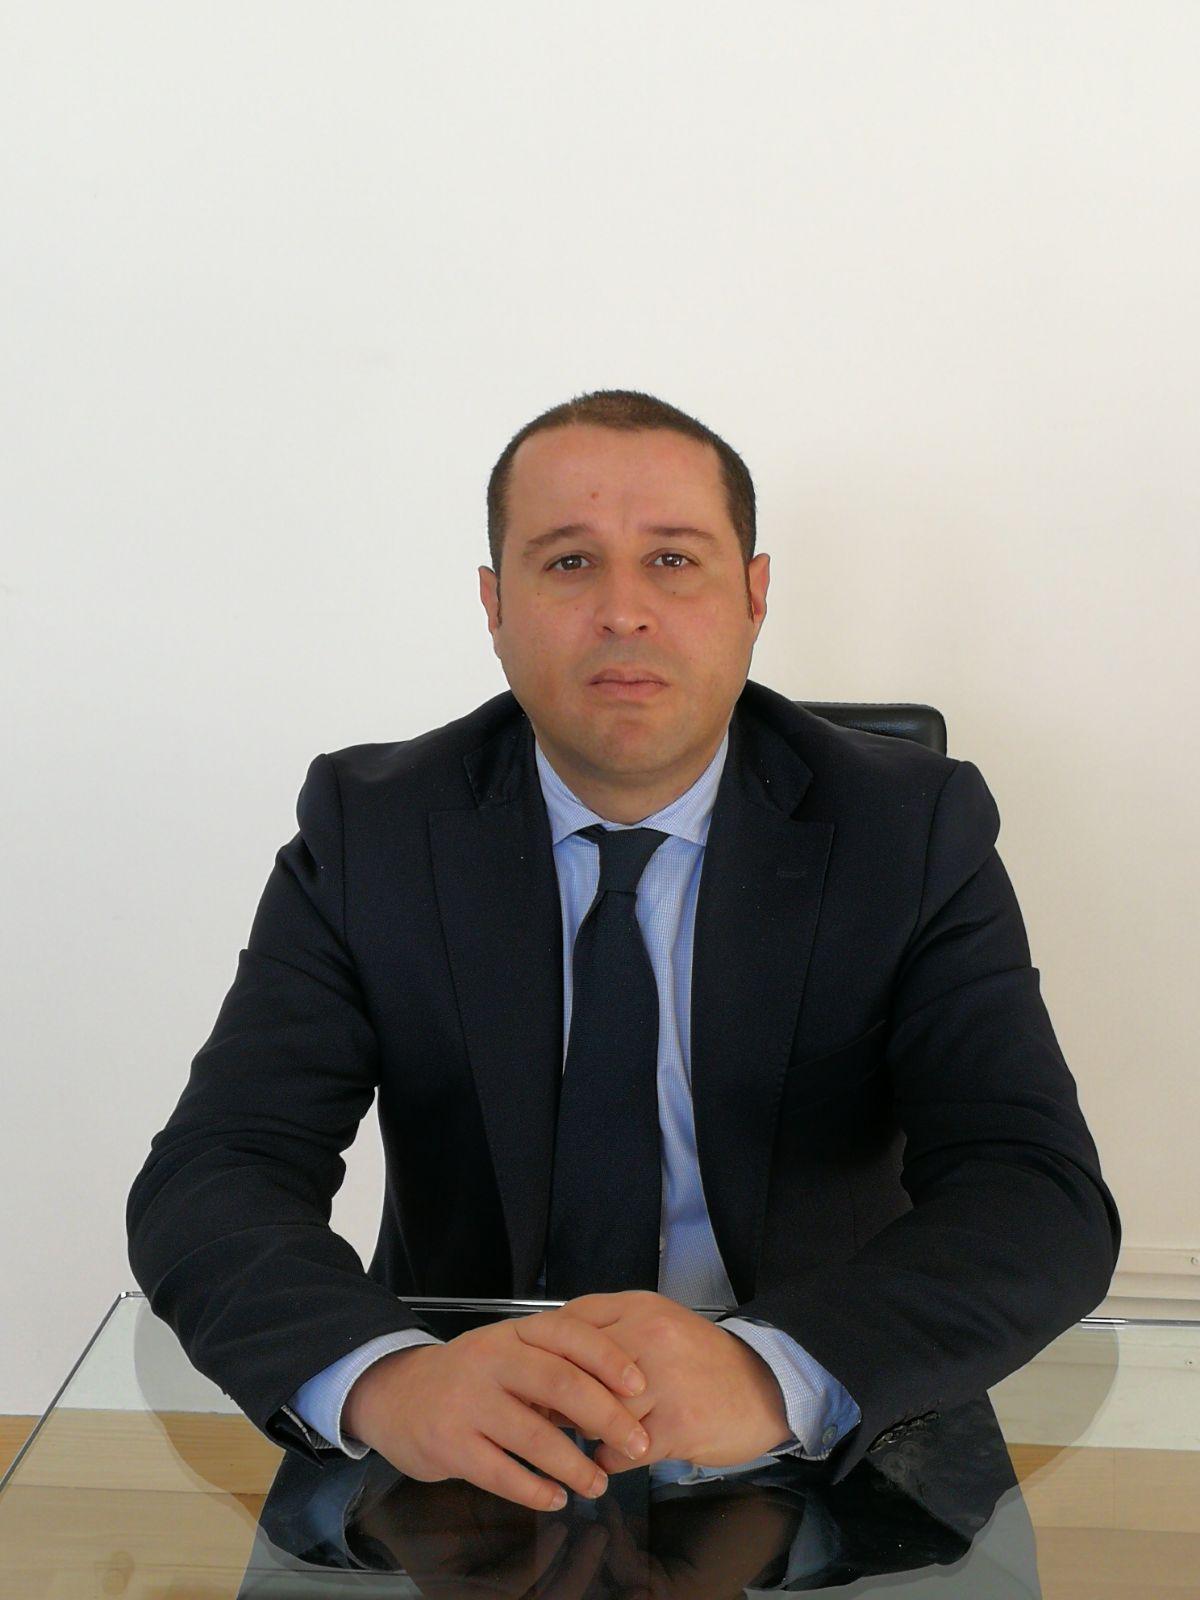 Matteo Tocchi